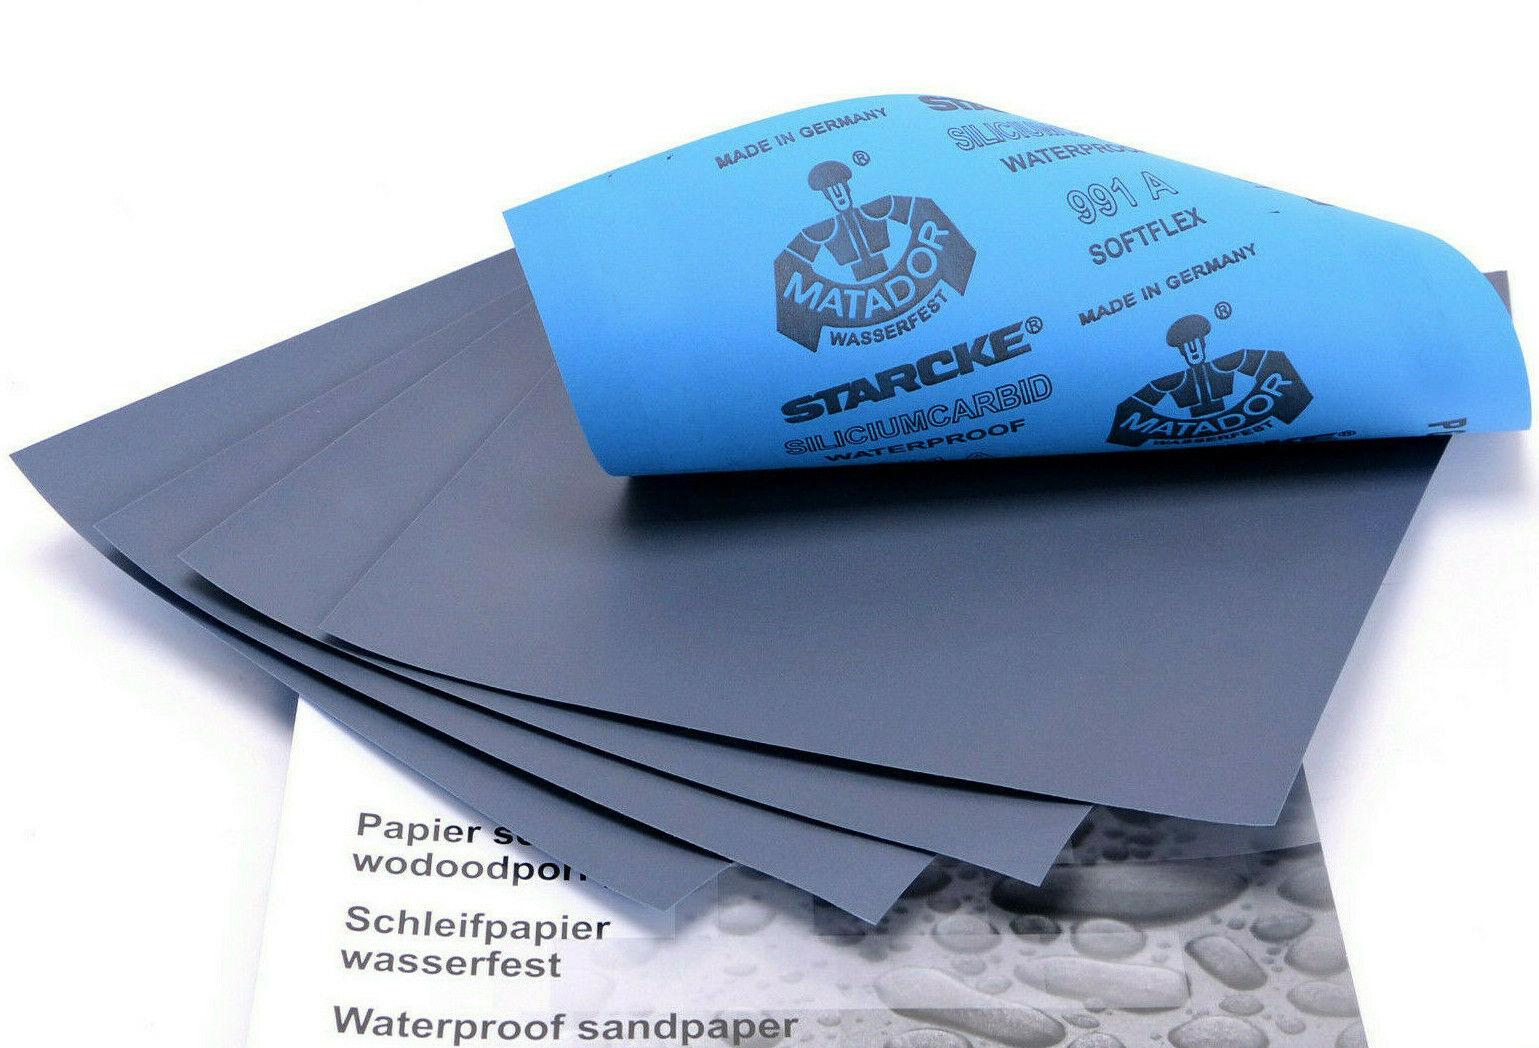 Matador Schleifpapier Wasserfest Nassschleifpapier 230mm x 280mm Lack Autolack